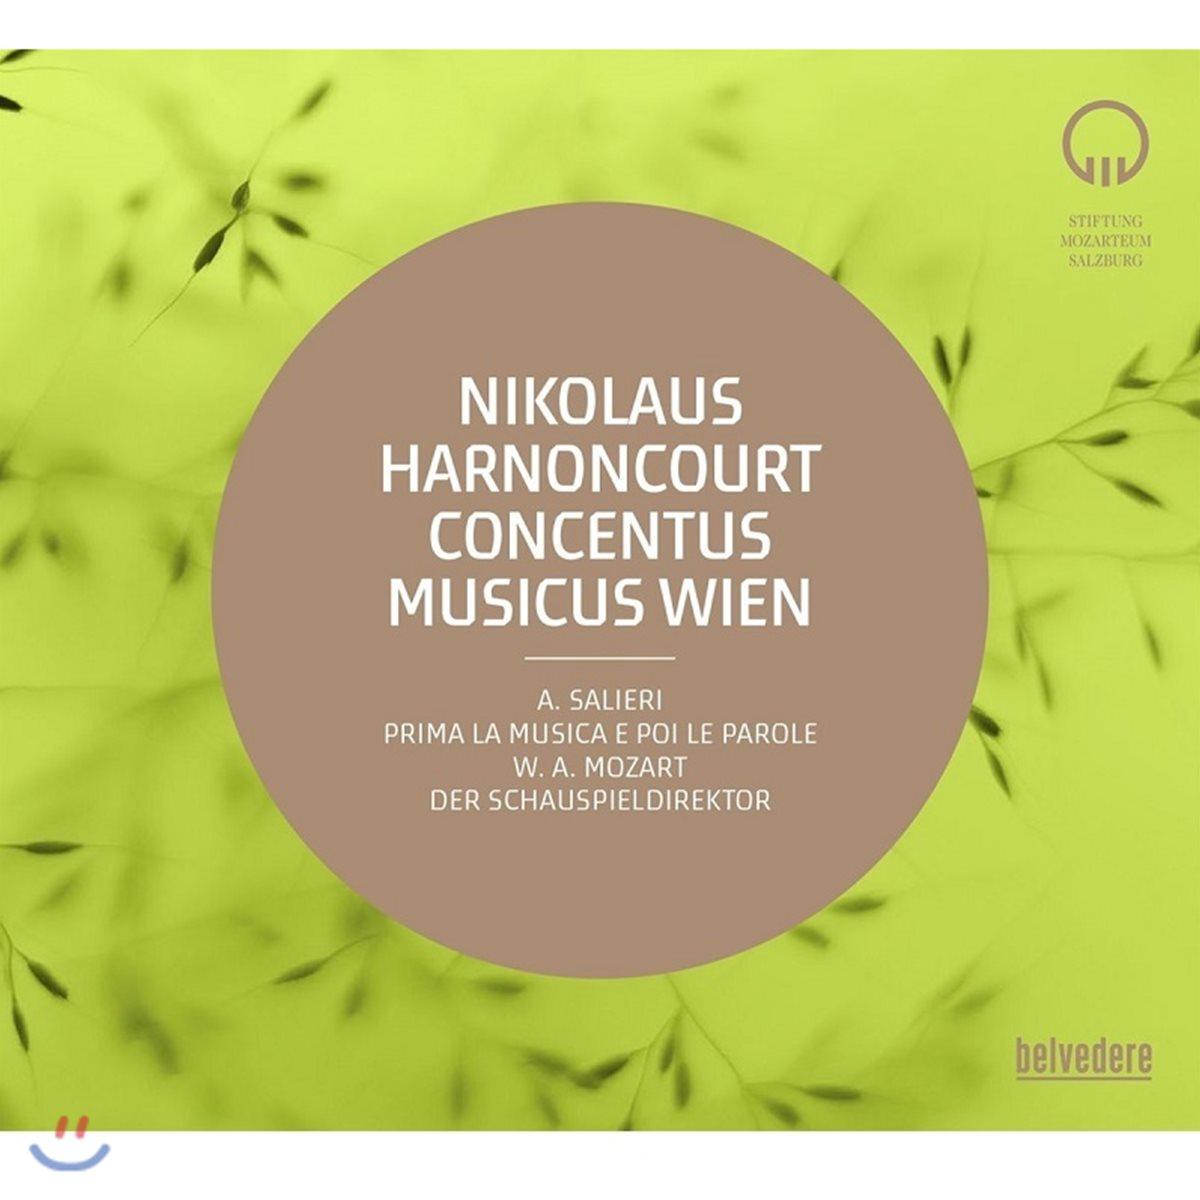 Nikolaus Harnoncourt 모차르트: 극장 지배인 / 살리에리: 음악이 먼저, 말은 그 다음에 (Salieri: Prima la Musica e Poi le Parole / Mozart: Der Schauspieldirektor)